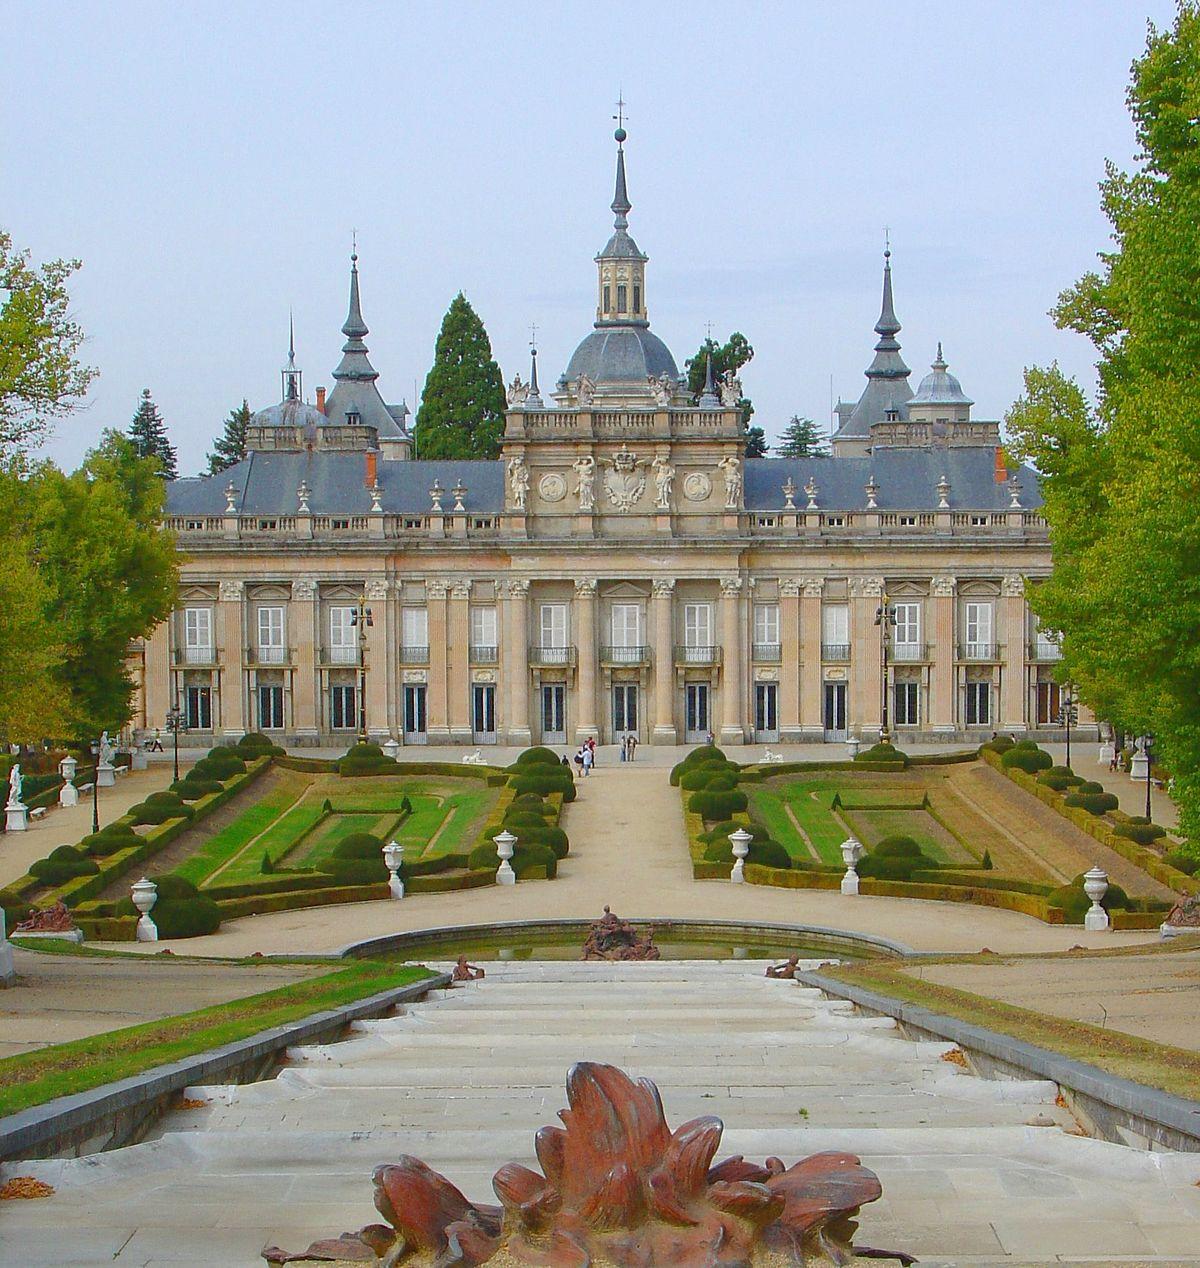 Palacio real de la granja de san ildefonso wikipedia la - Parador de la granja fotos ...